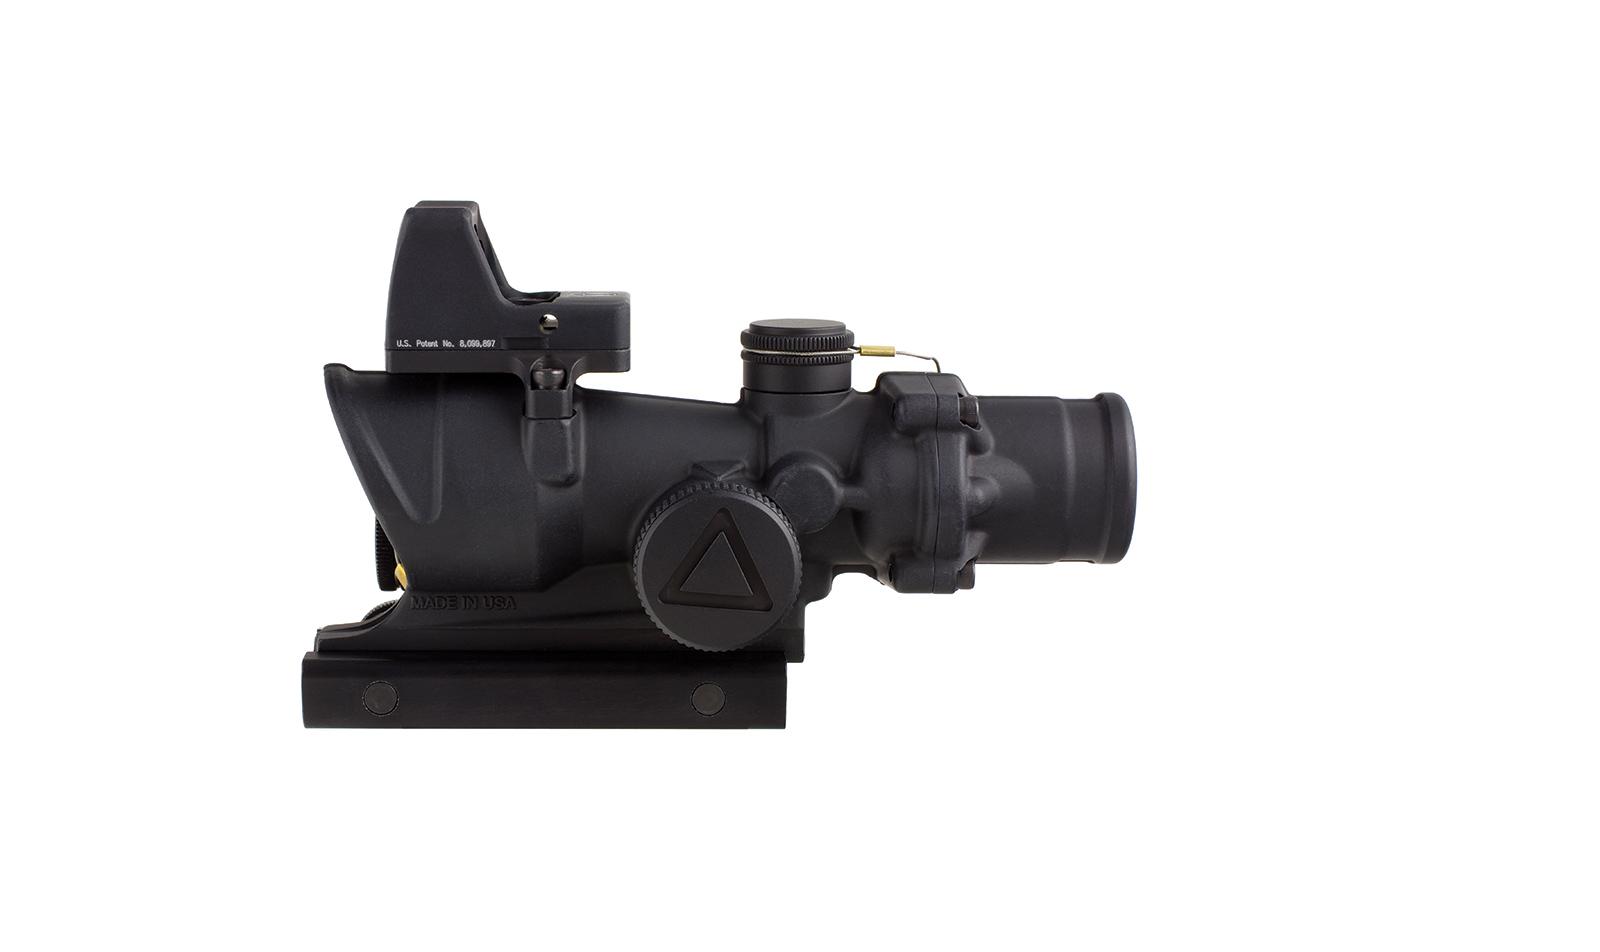 TA02-C-100558 angle 2